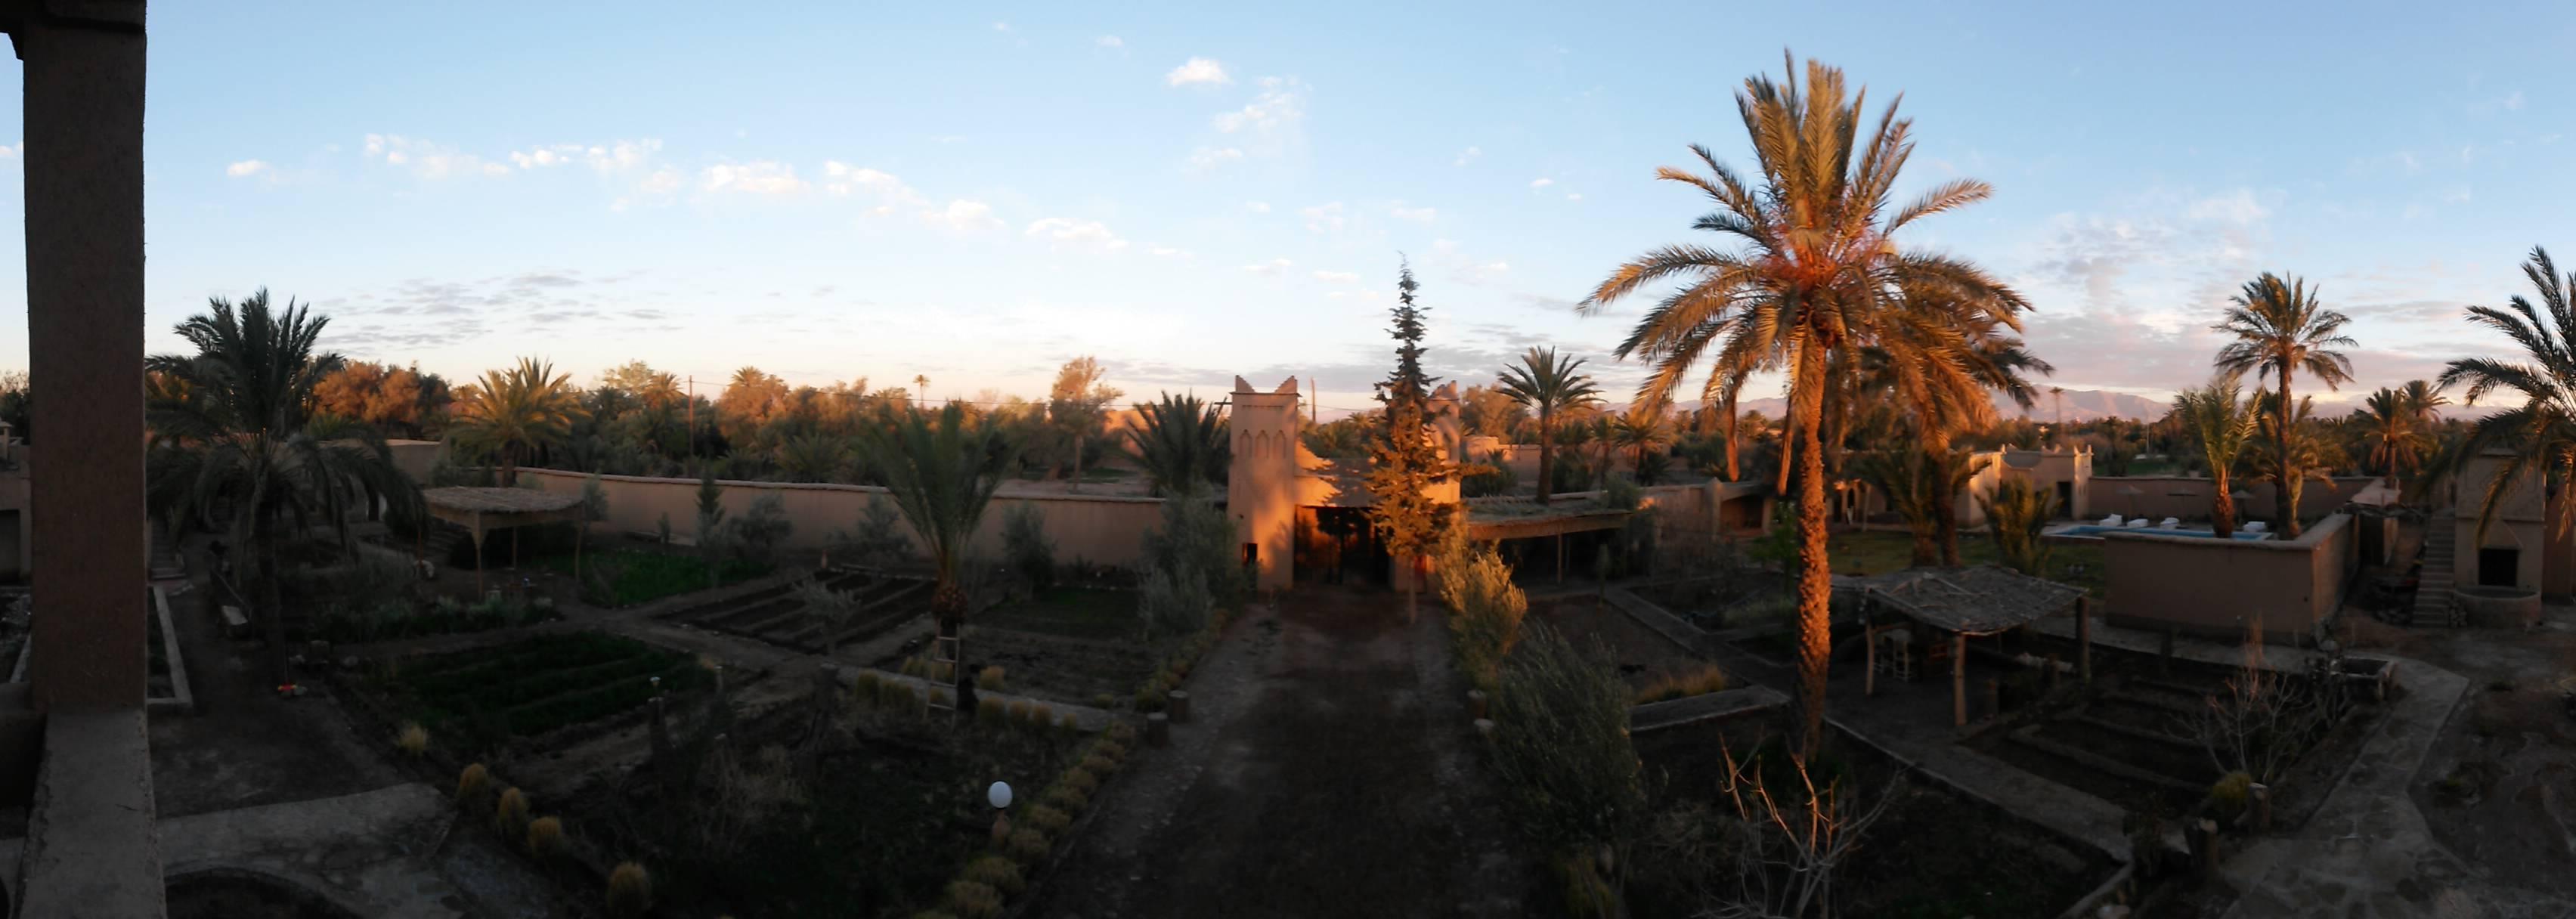 Photo 1: Kasbah Dar Essalam à Skoura